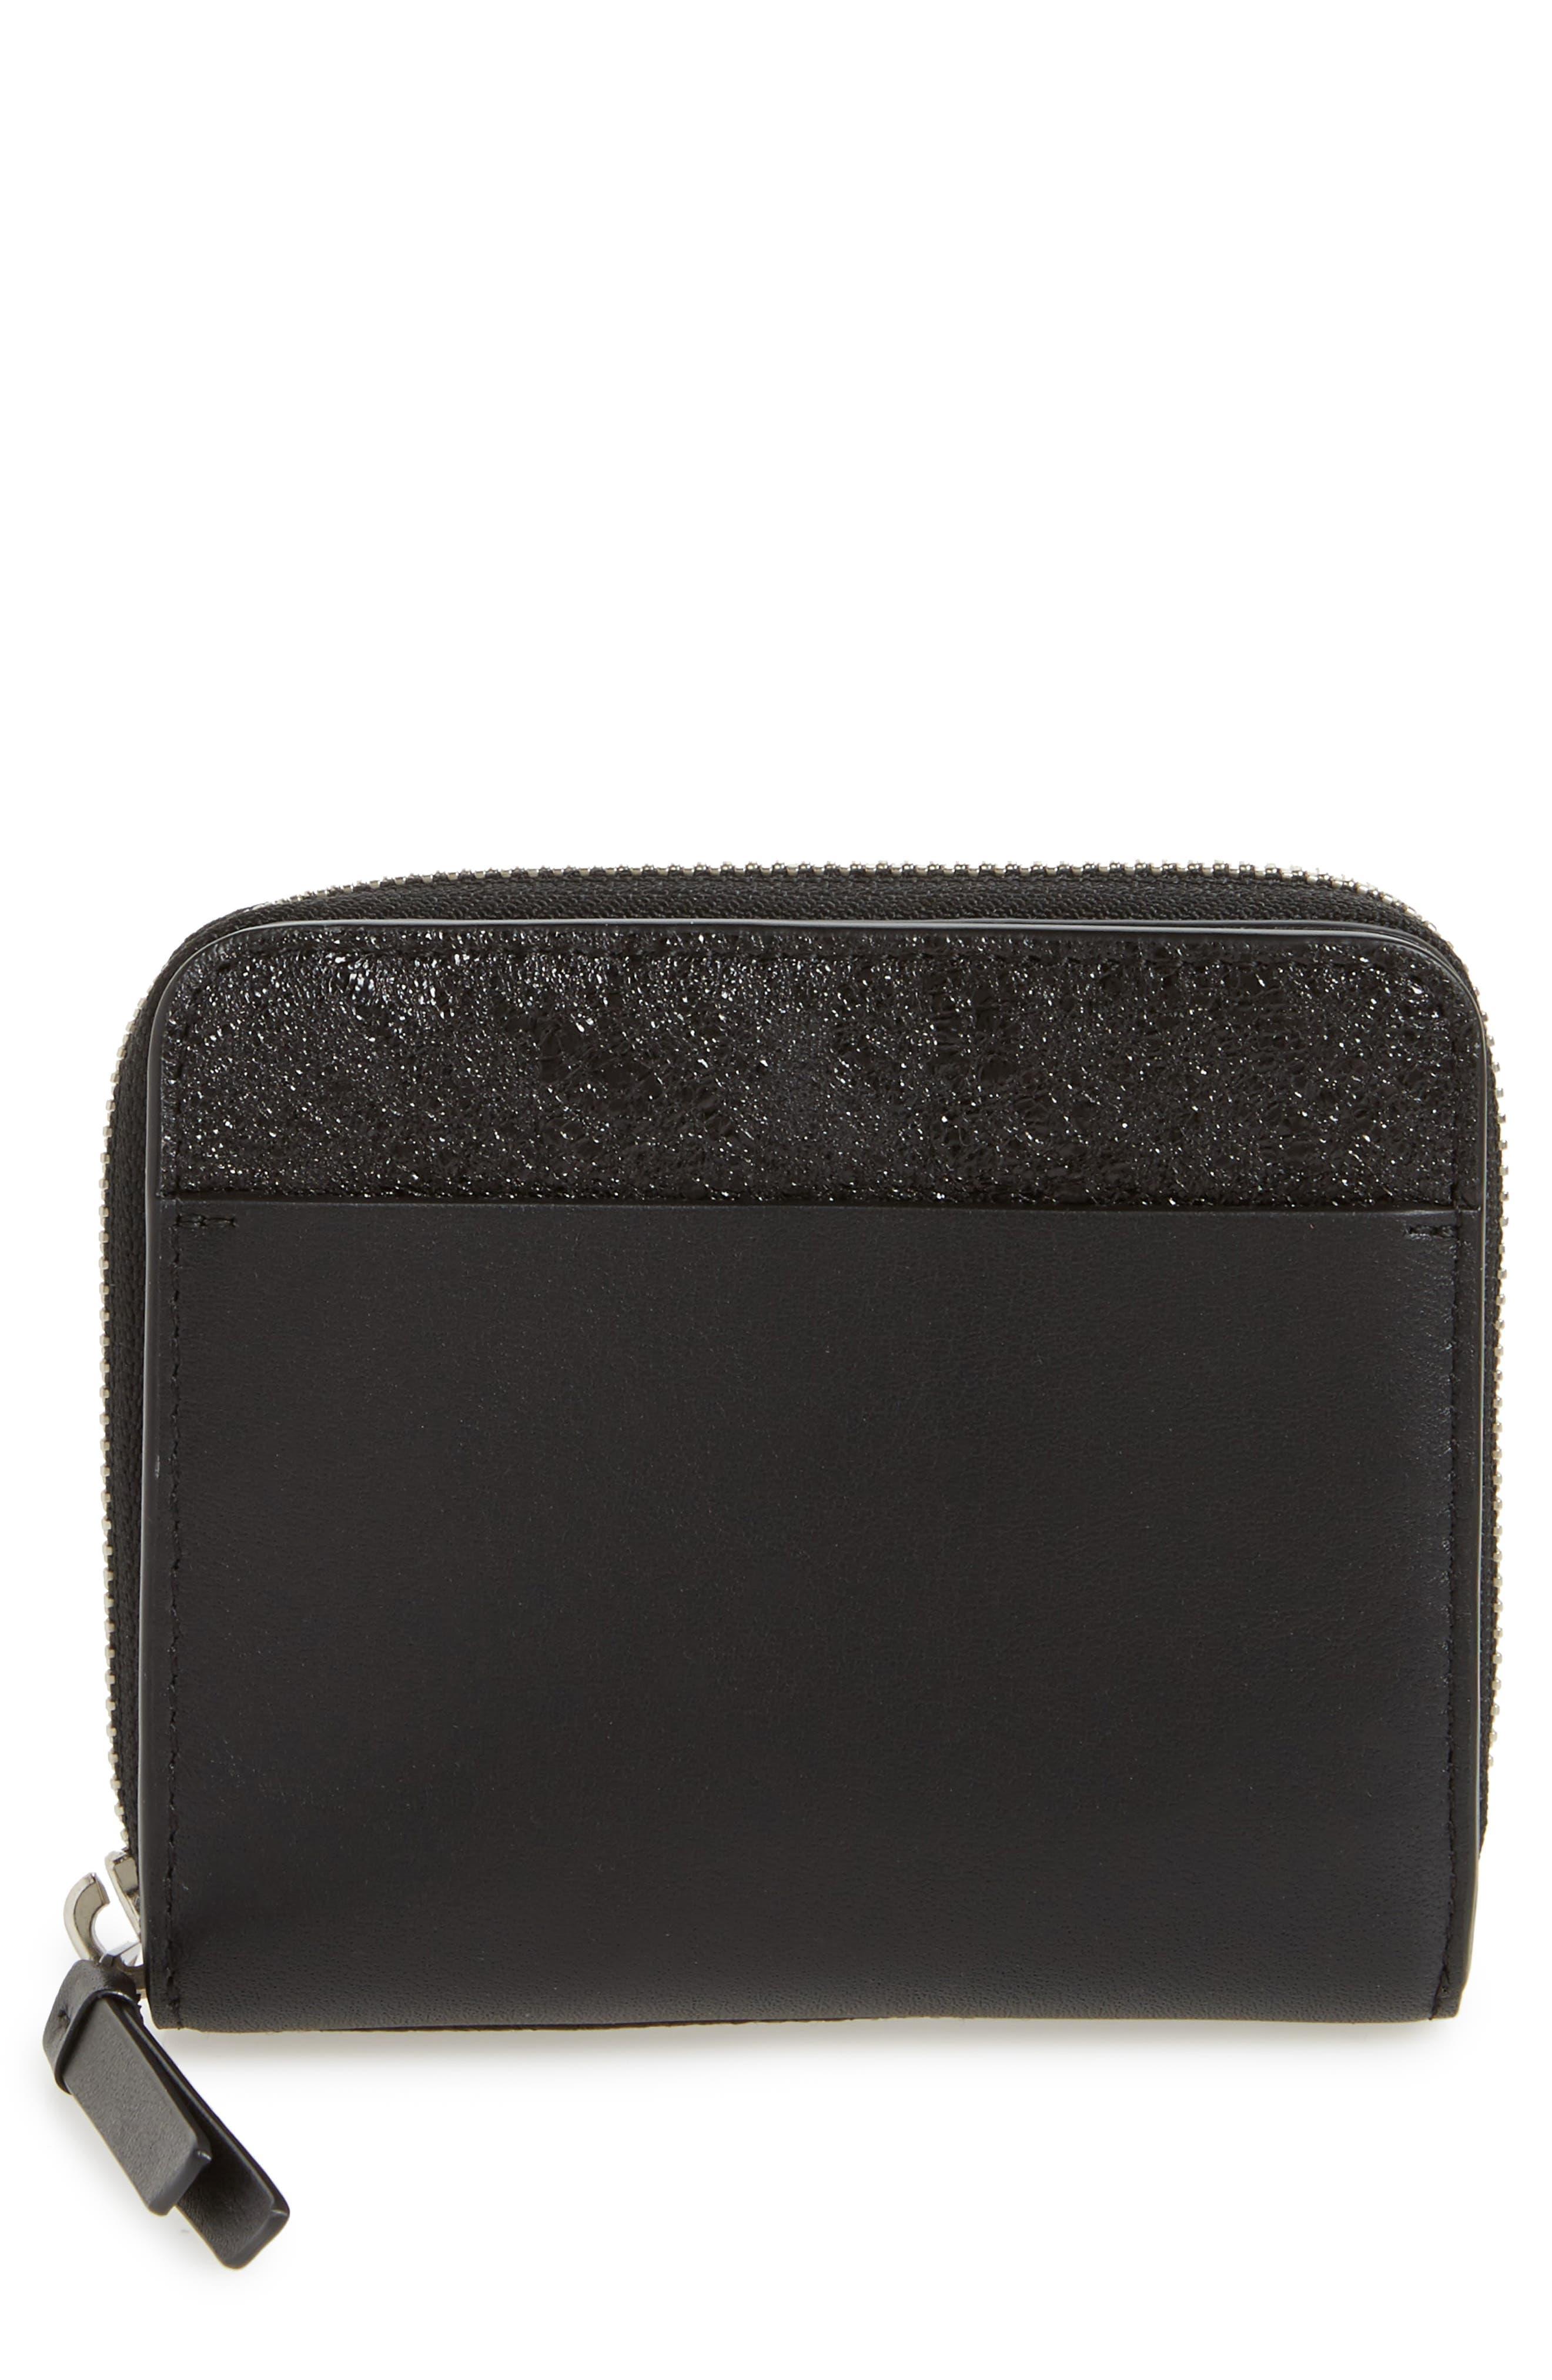 Main Image - ALLSAINTS Mast Shine Leather Wallet